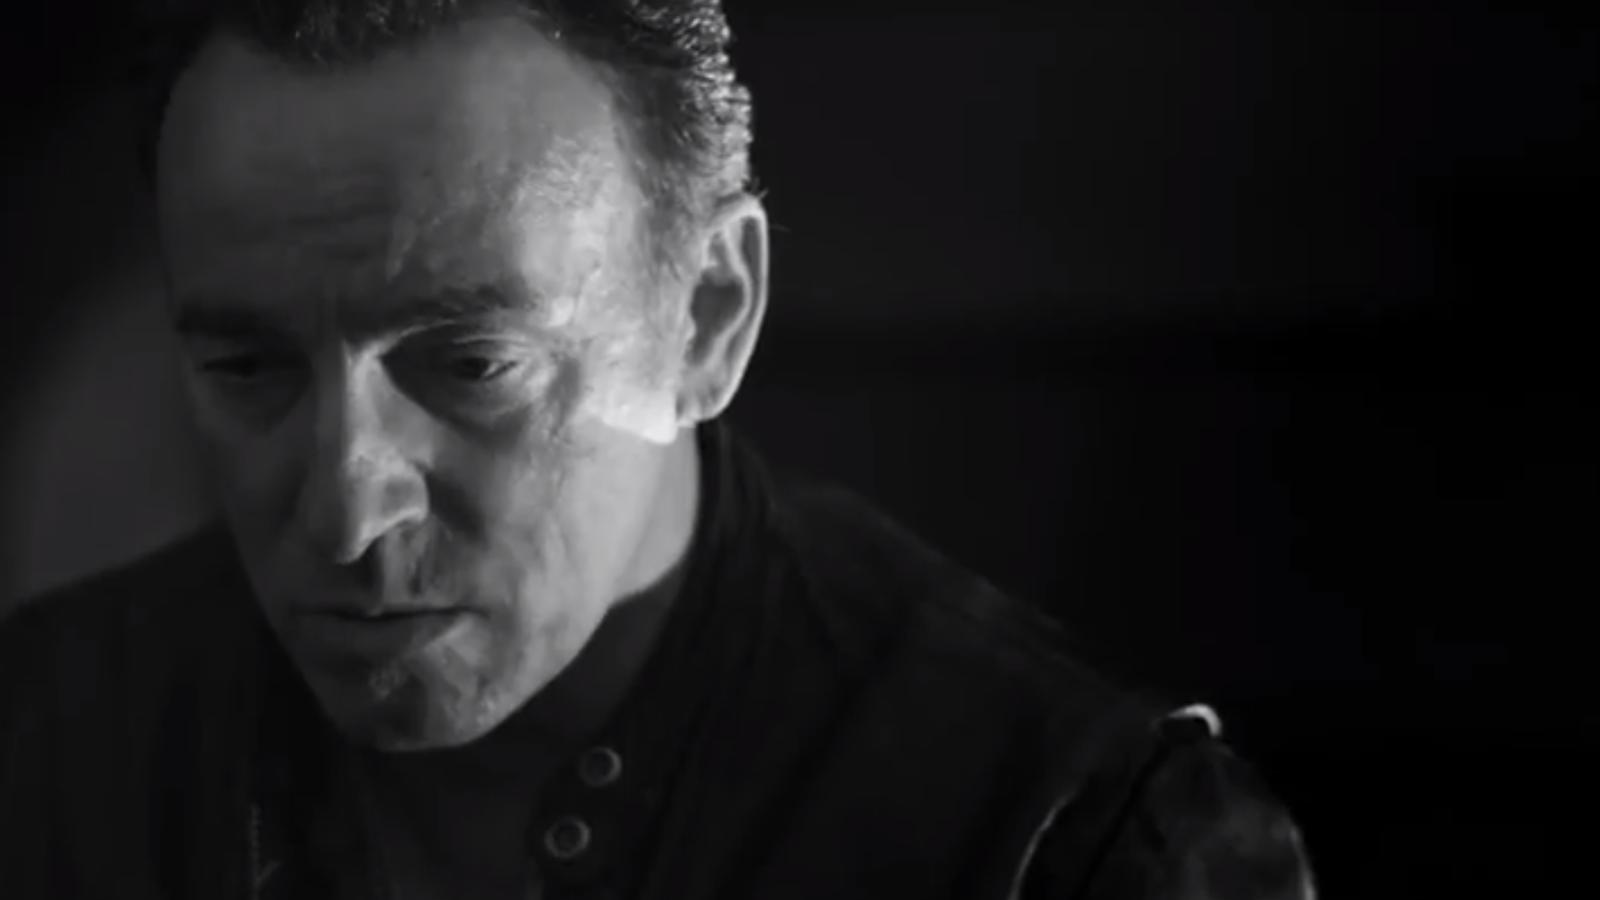 Bruce Springsteen estrena el videoclip 'We take care of our own'